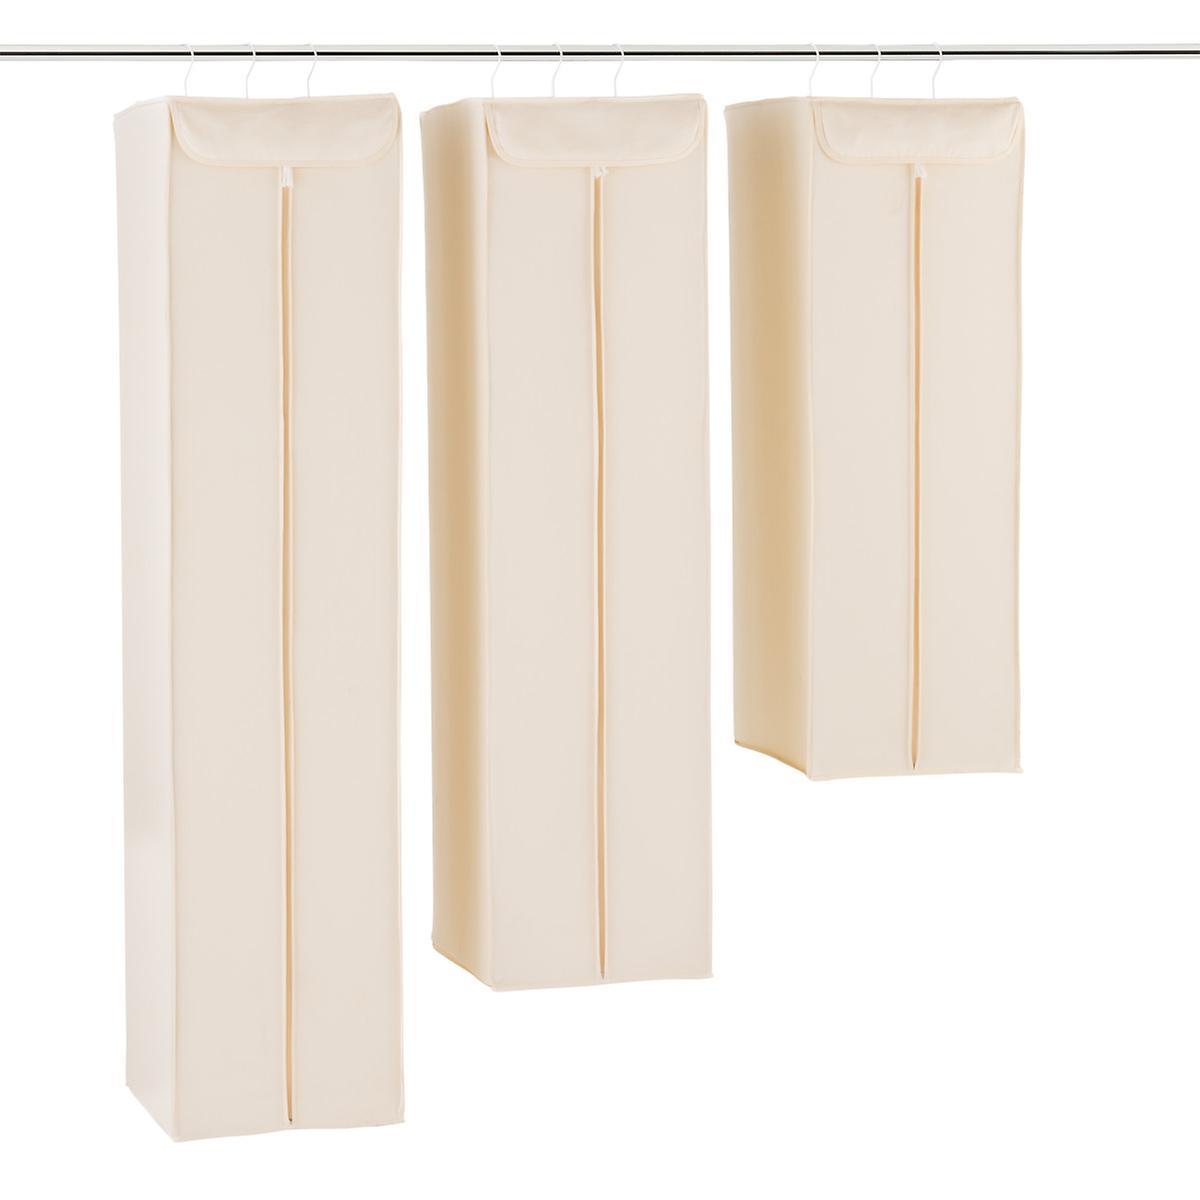 Suit Bags Amp Dress Bags Natural Cotton Hanging Storage